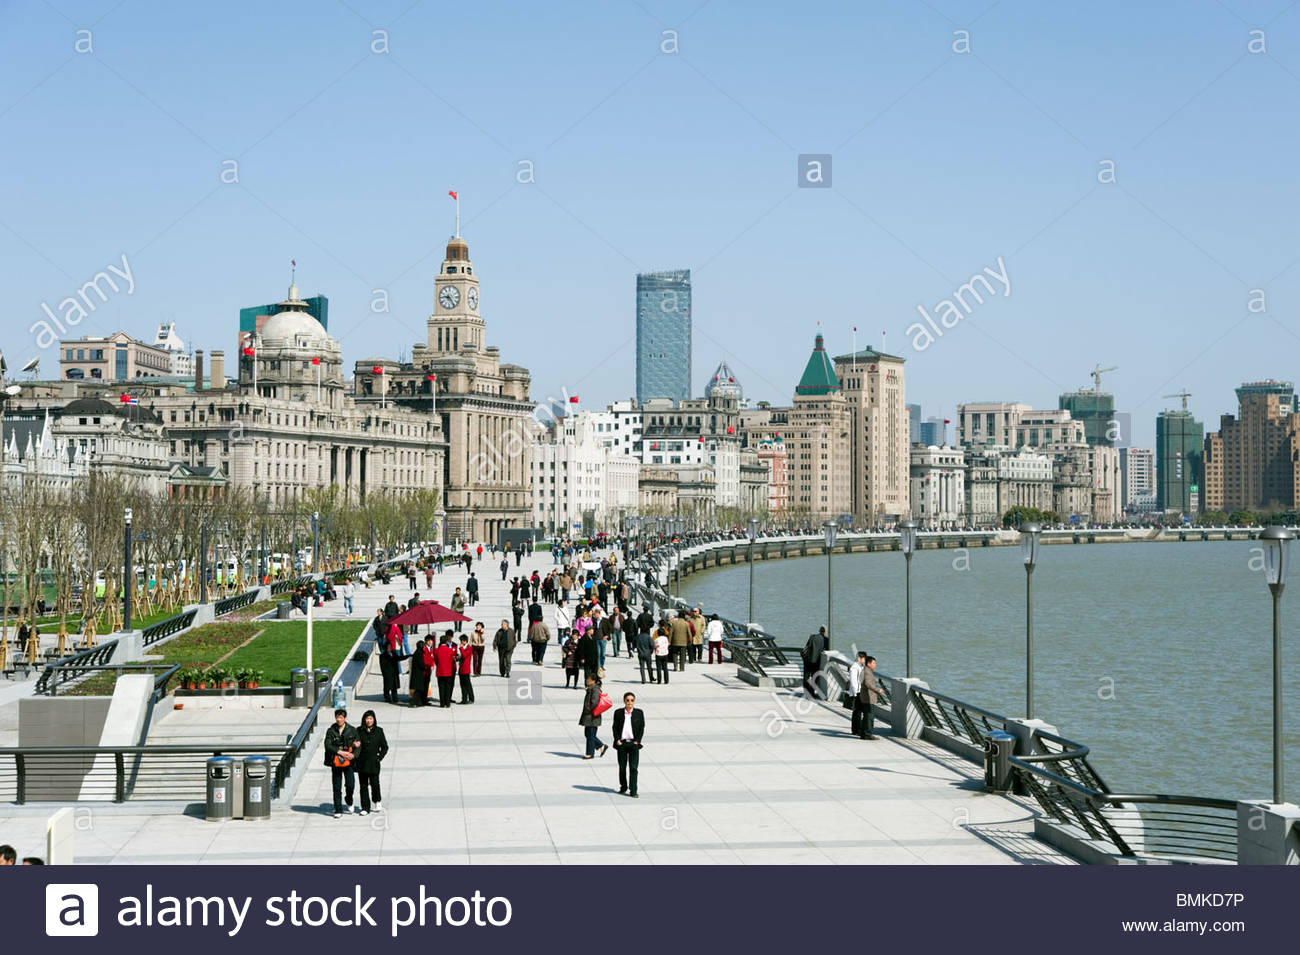 Il Bund promenade, Shanghai, Cina Immagini Stock